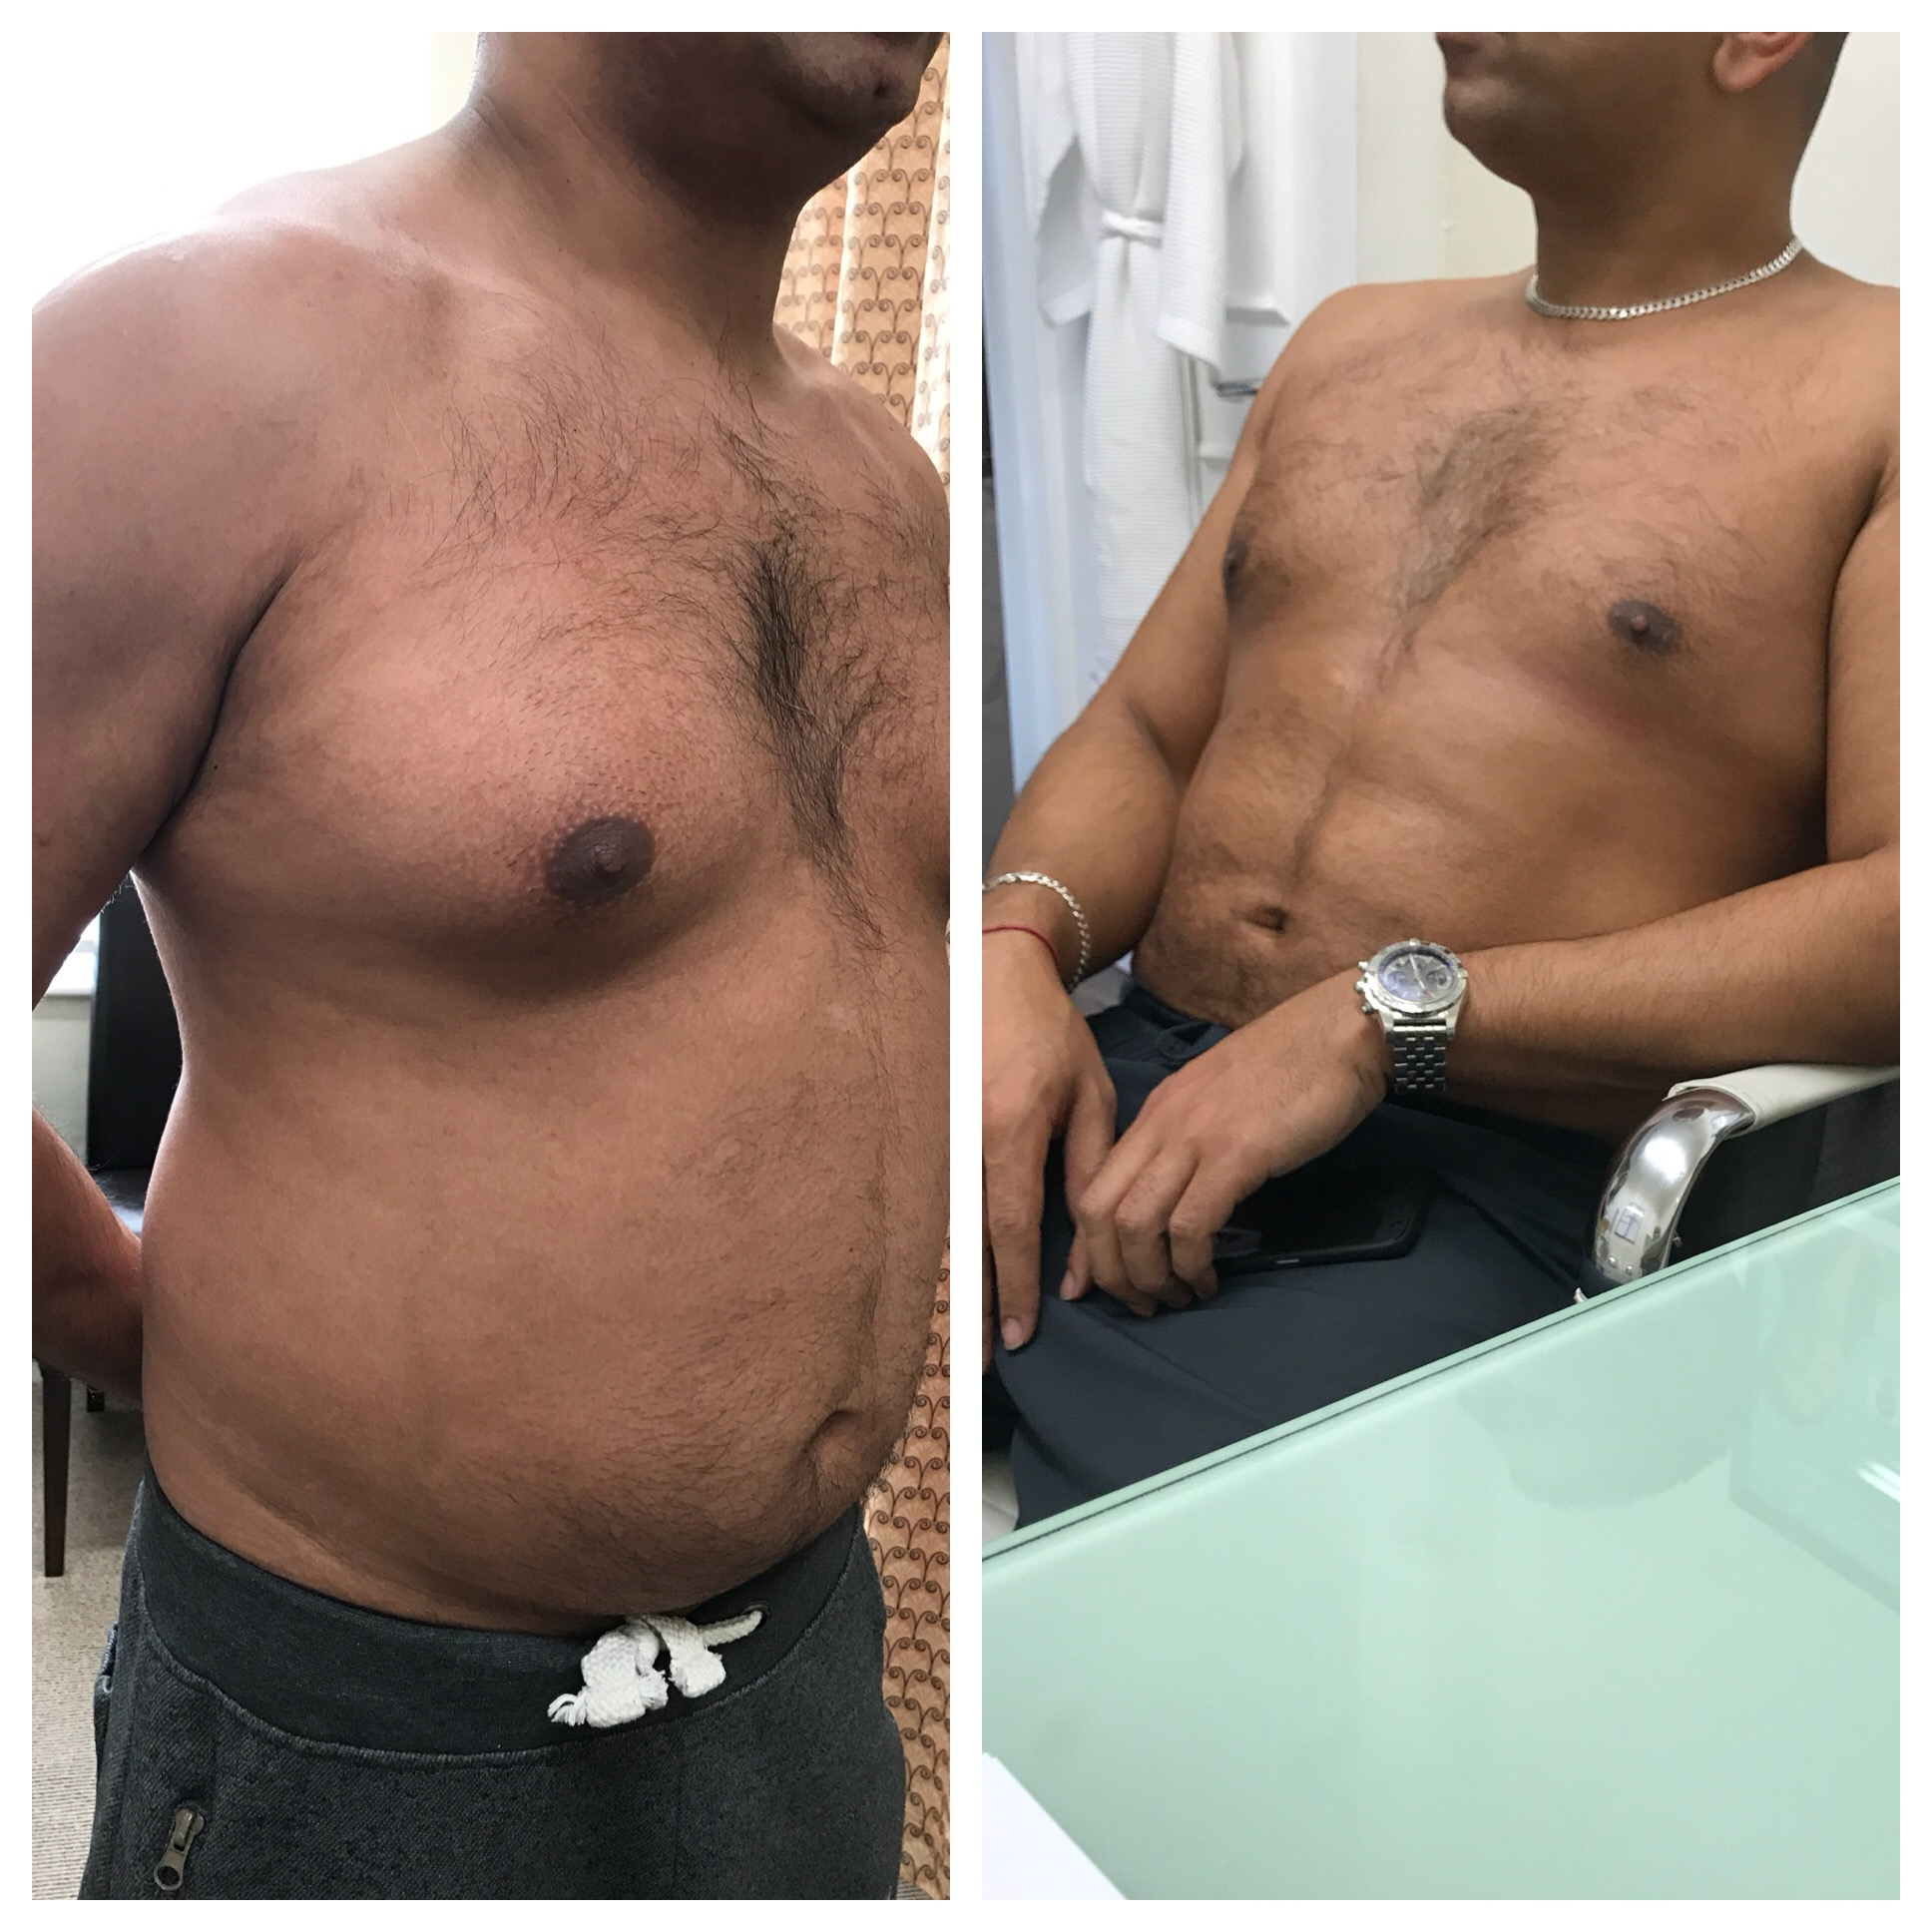 vaser chest and tummy, very confident